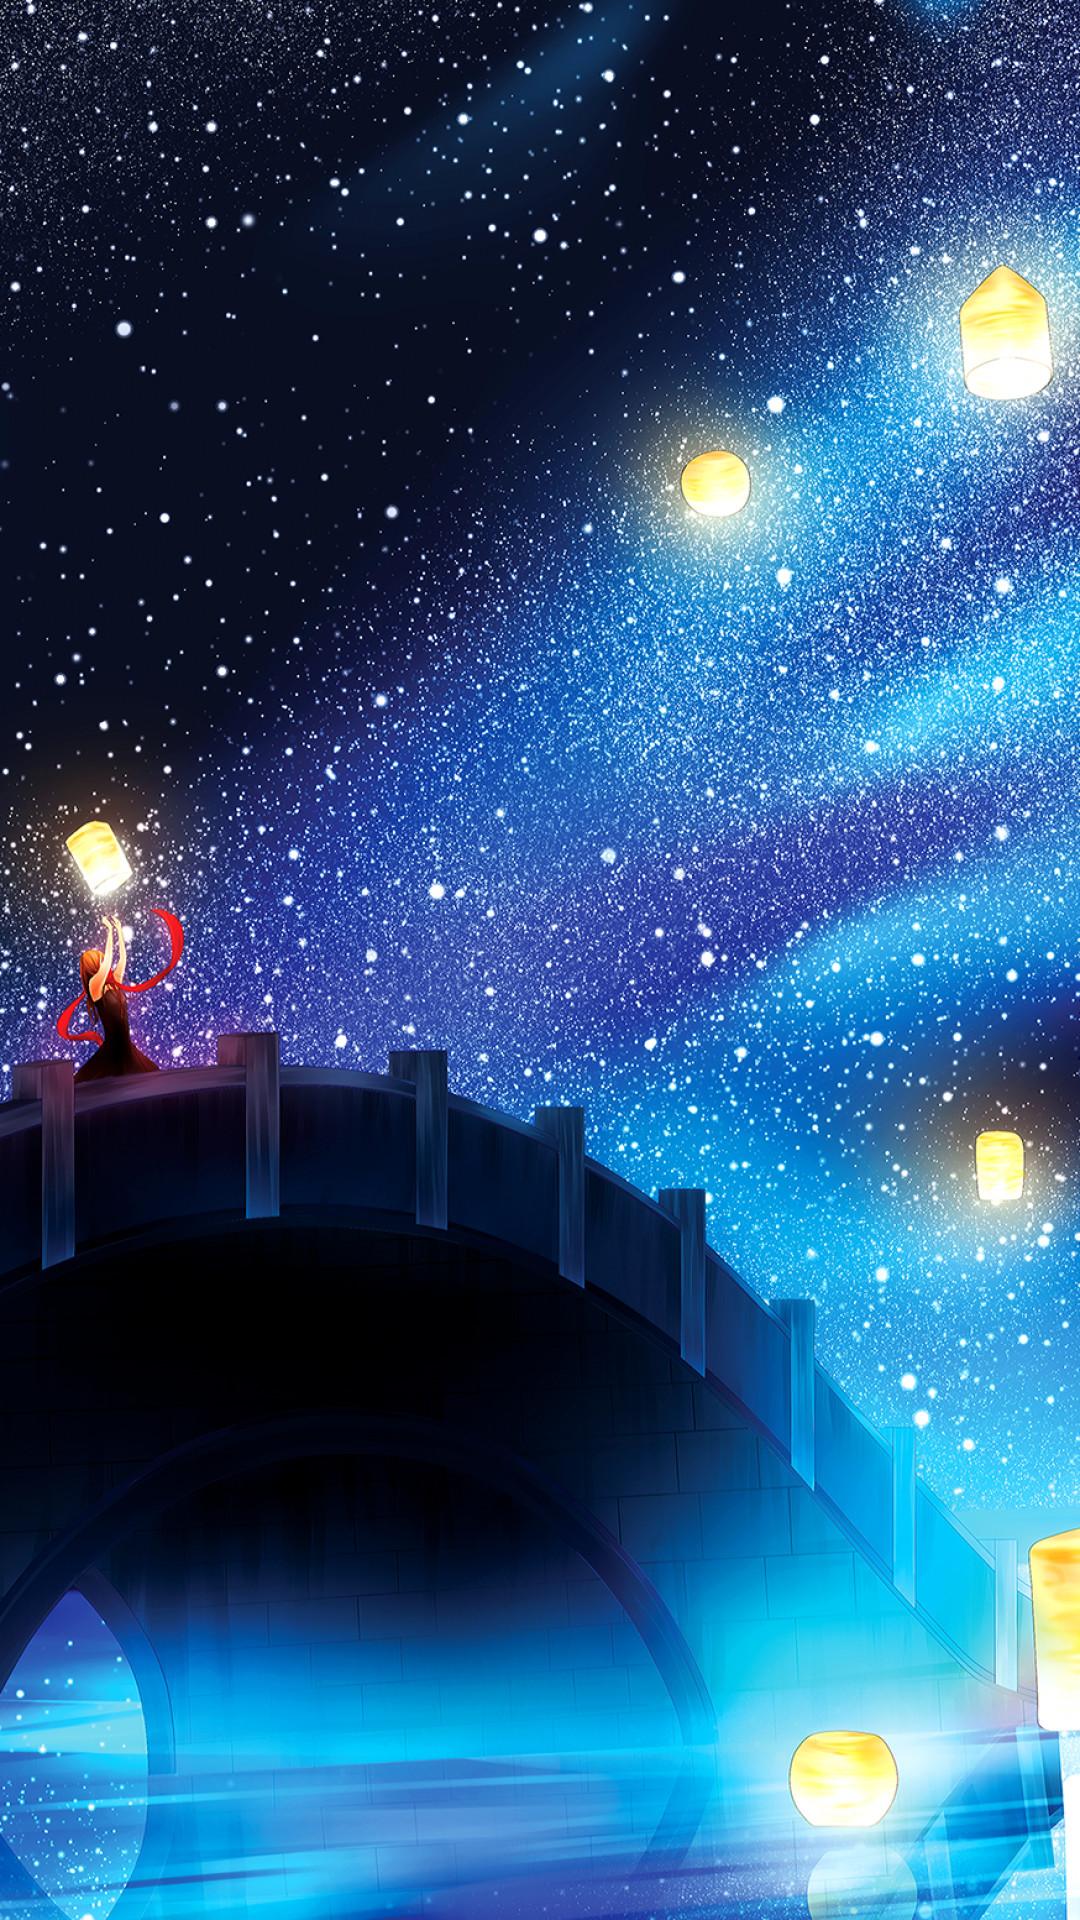 Anime Landscape, Lantern, Stars, Bridge